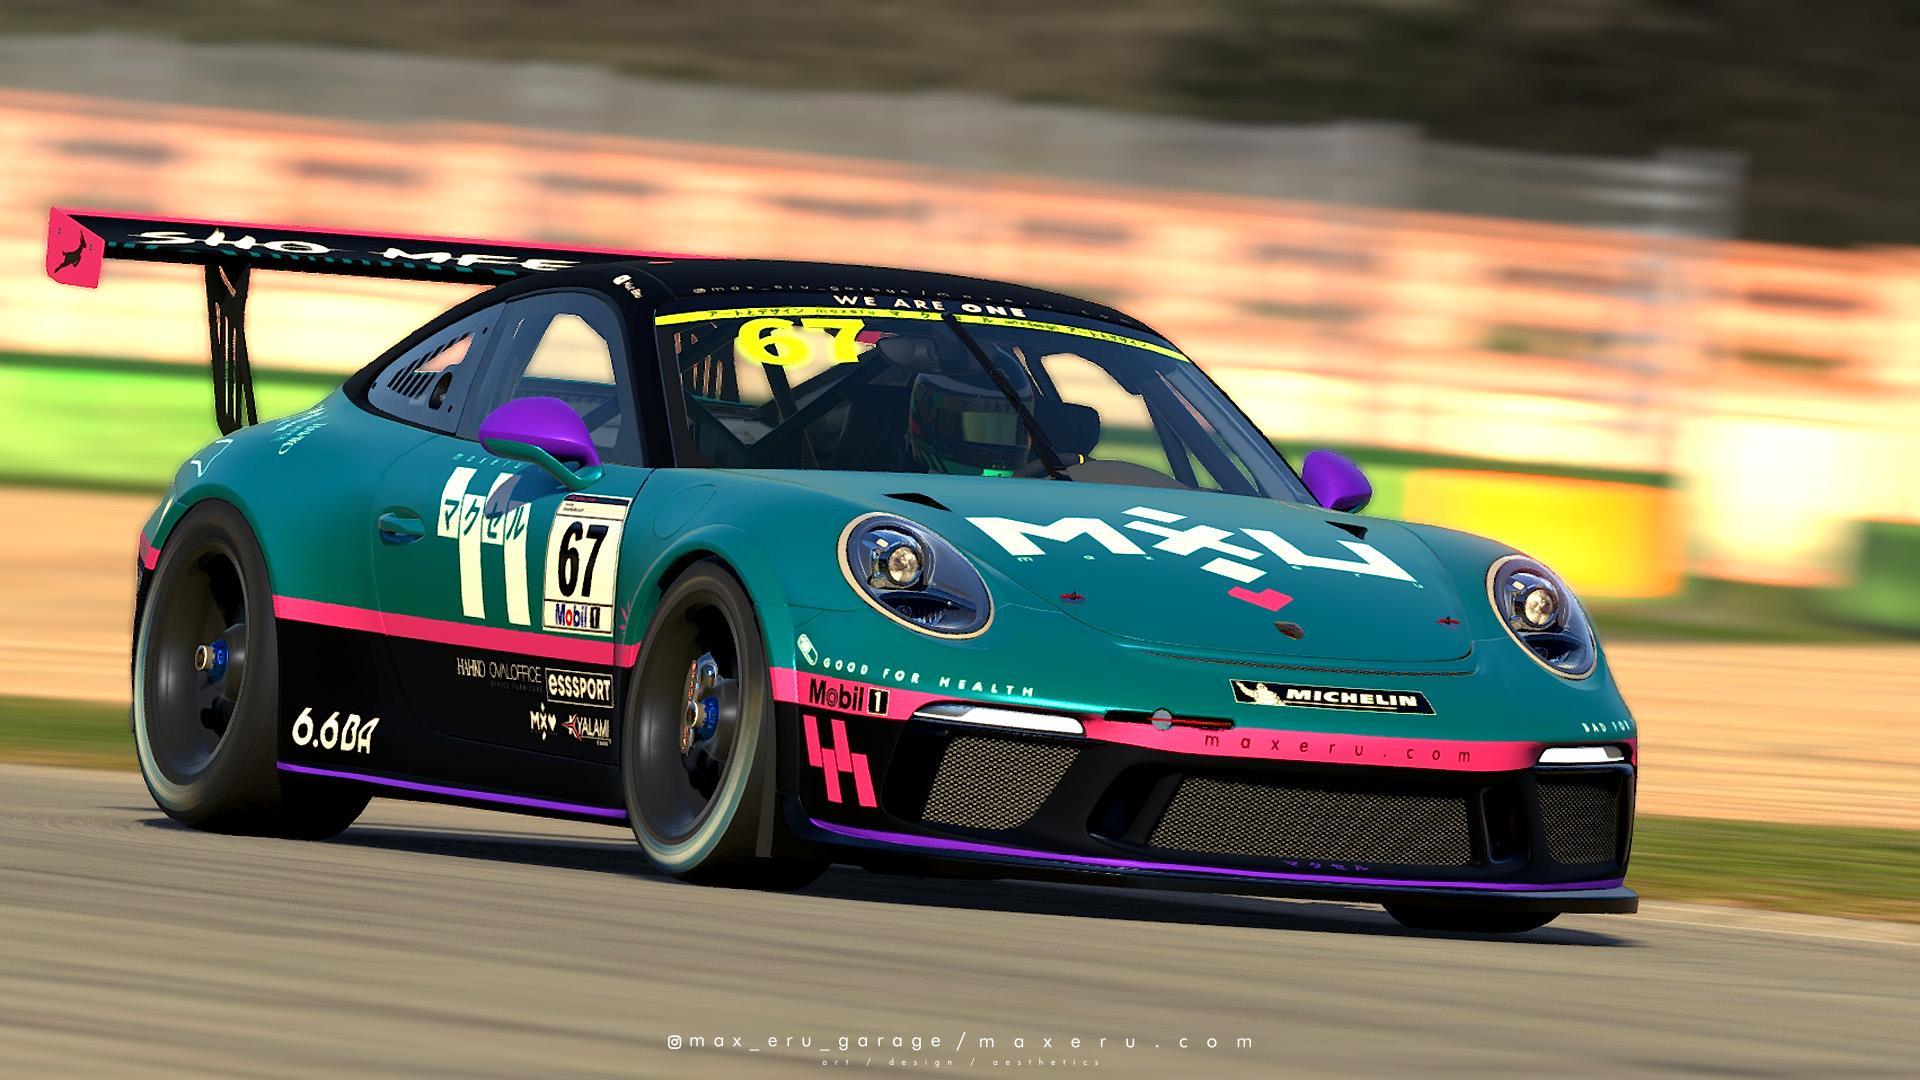 Preview of MXU Minimal Aqua-P - Porsche 911 GT3 Cup by Bryce L.